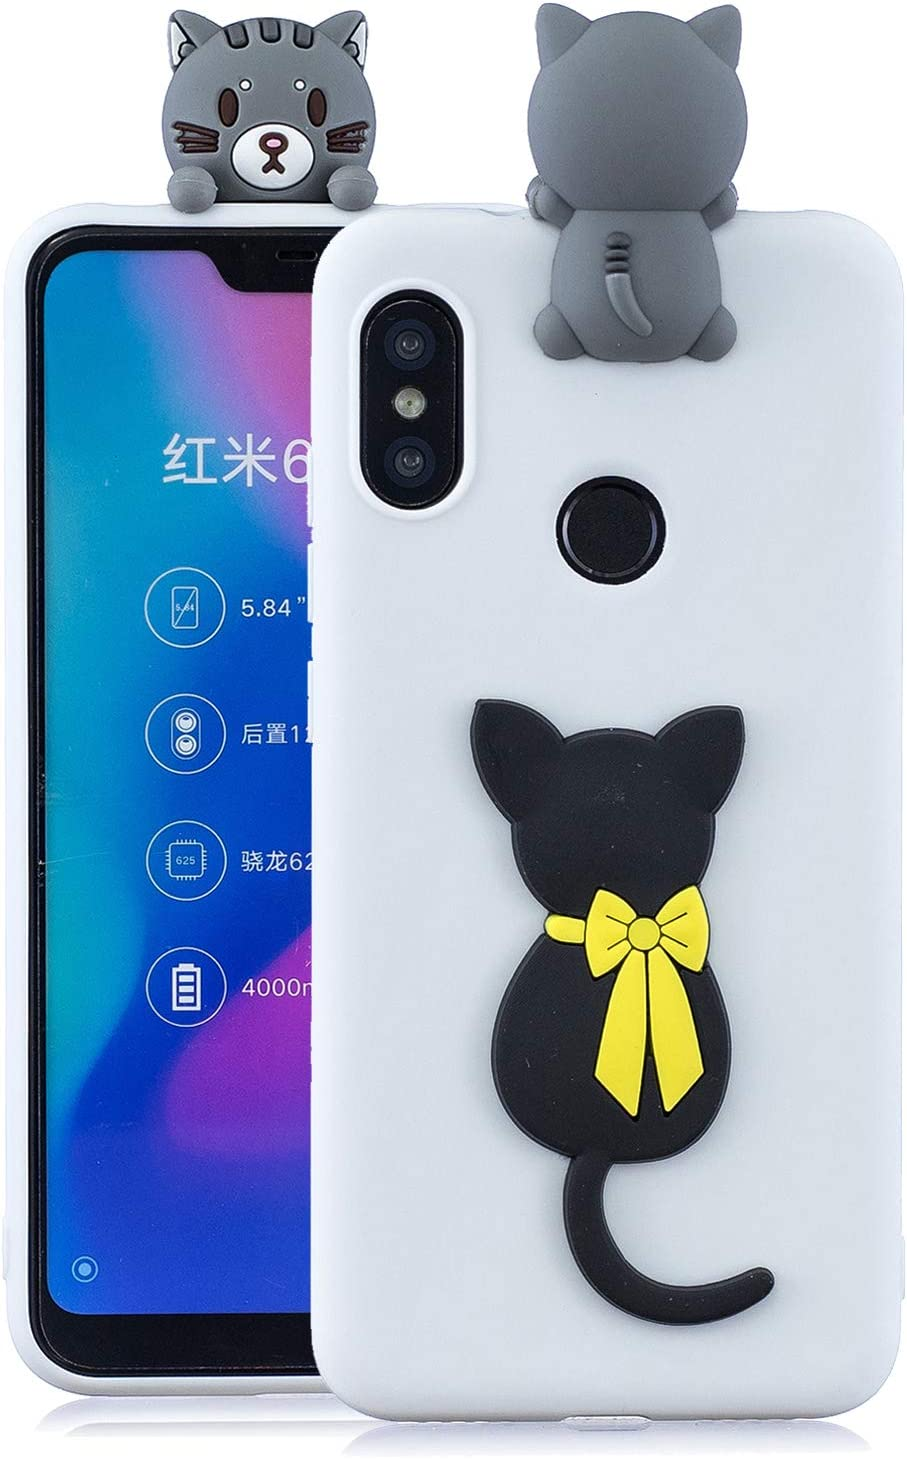 Funluna Funda para Xiaomi Mi A2 Lite, 3D Gato Negro Patrón Cover Ultra Delgado TPU Goma Cover Suave Carcasa Silicona Gel Anti-Rasguño Protectora Espalda Caso Bumper Case para Xiaomi Mi A2 Lite